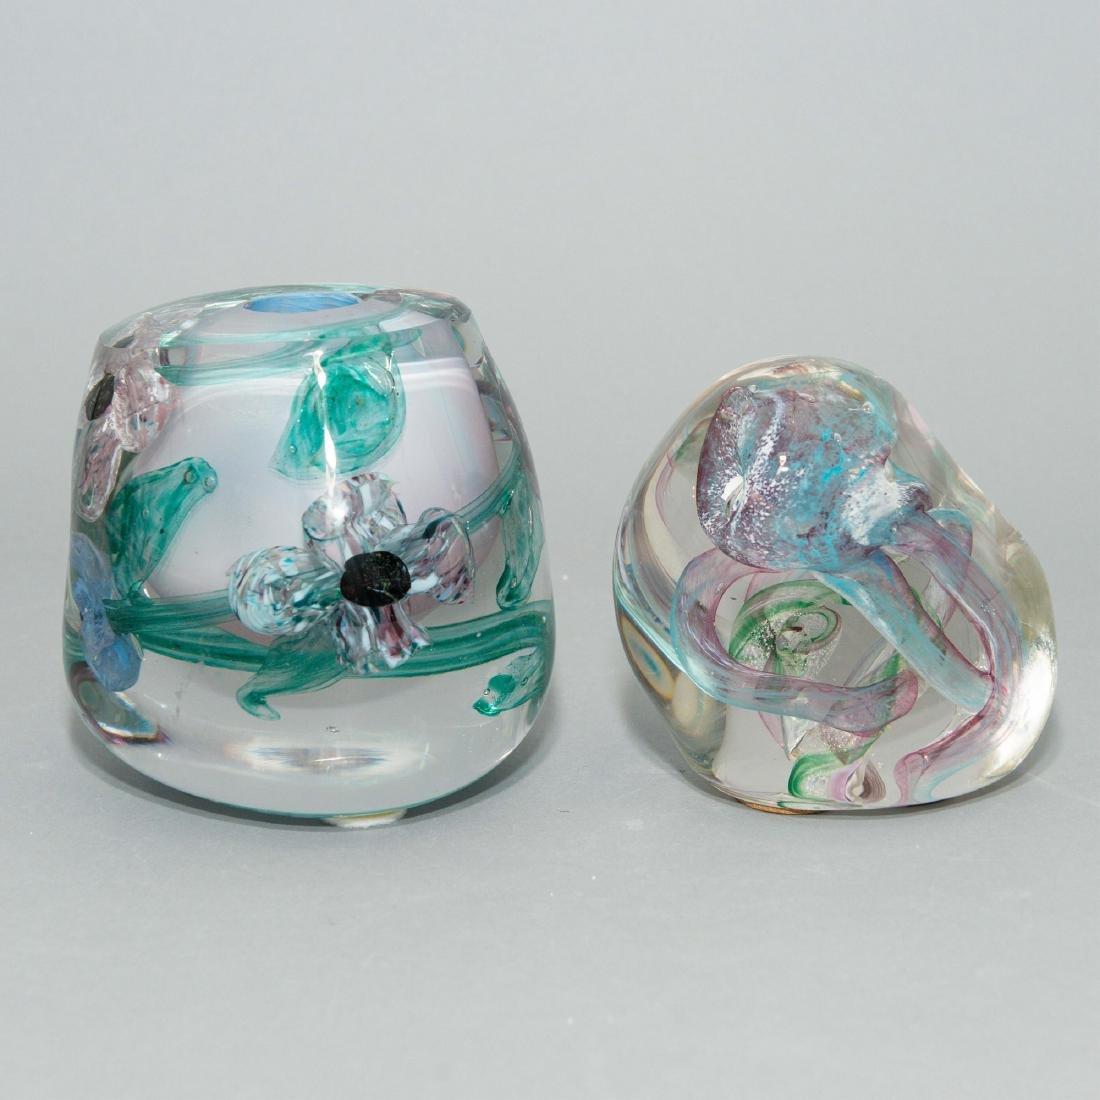 PAIR OF LISA LEYDON ART GLASS VASE AND SCULPTURE